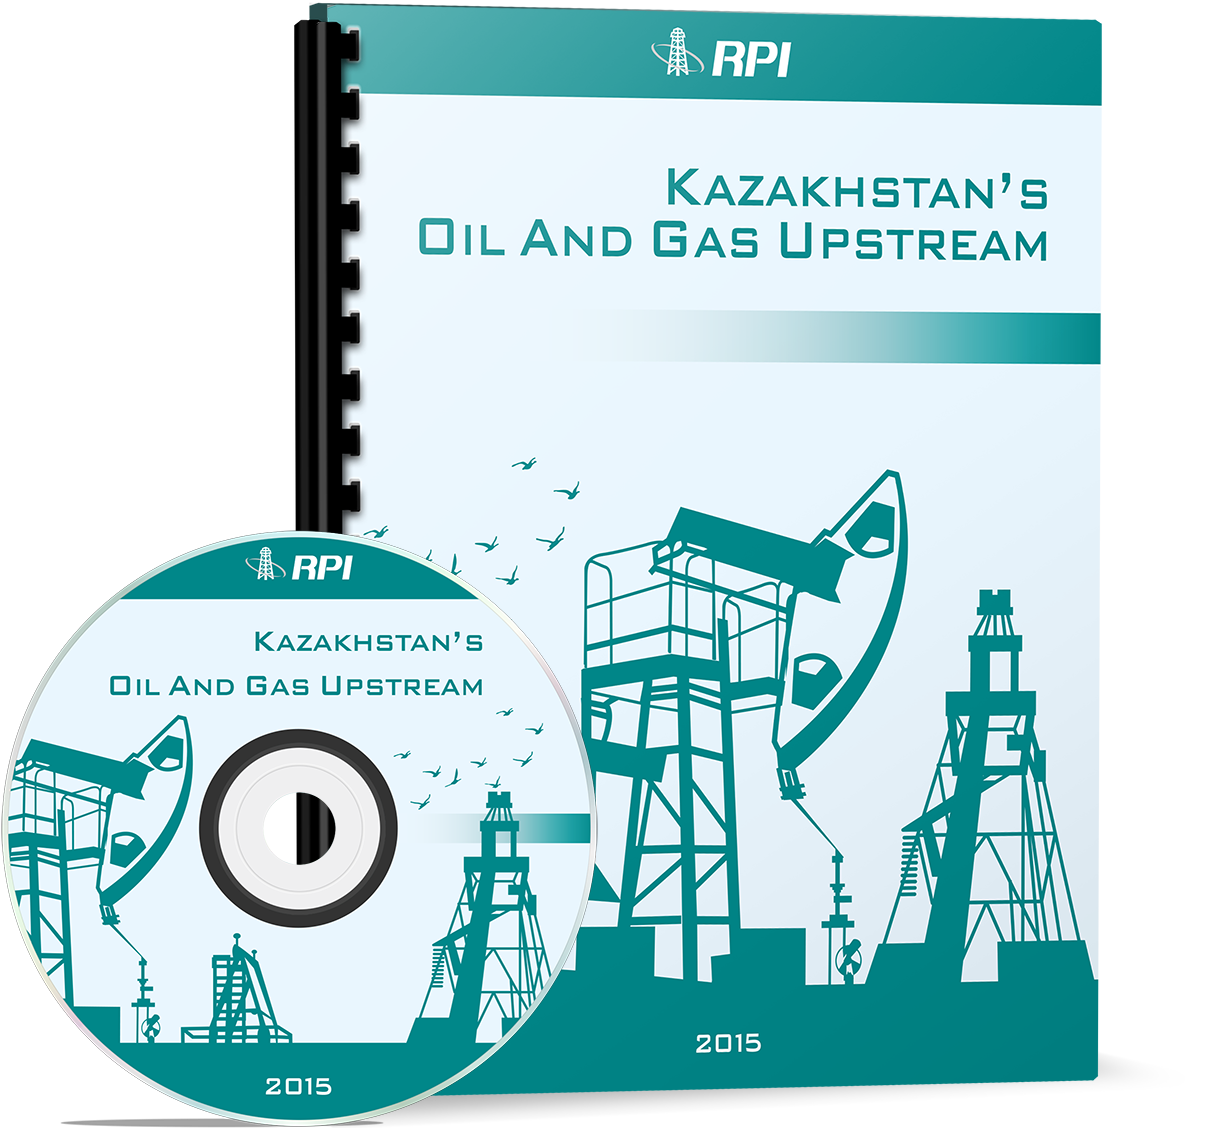 Kazakhstan oil and gas